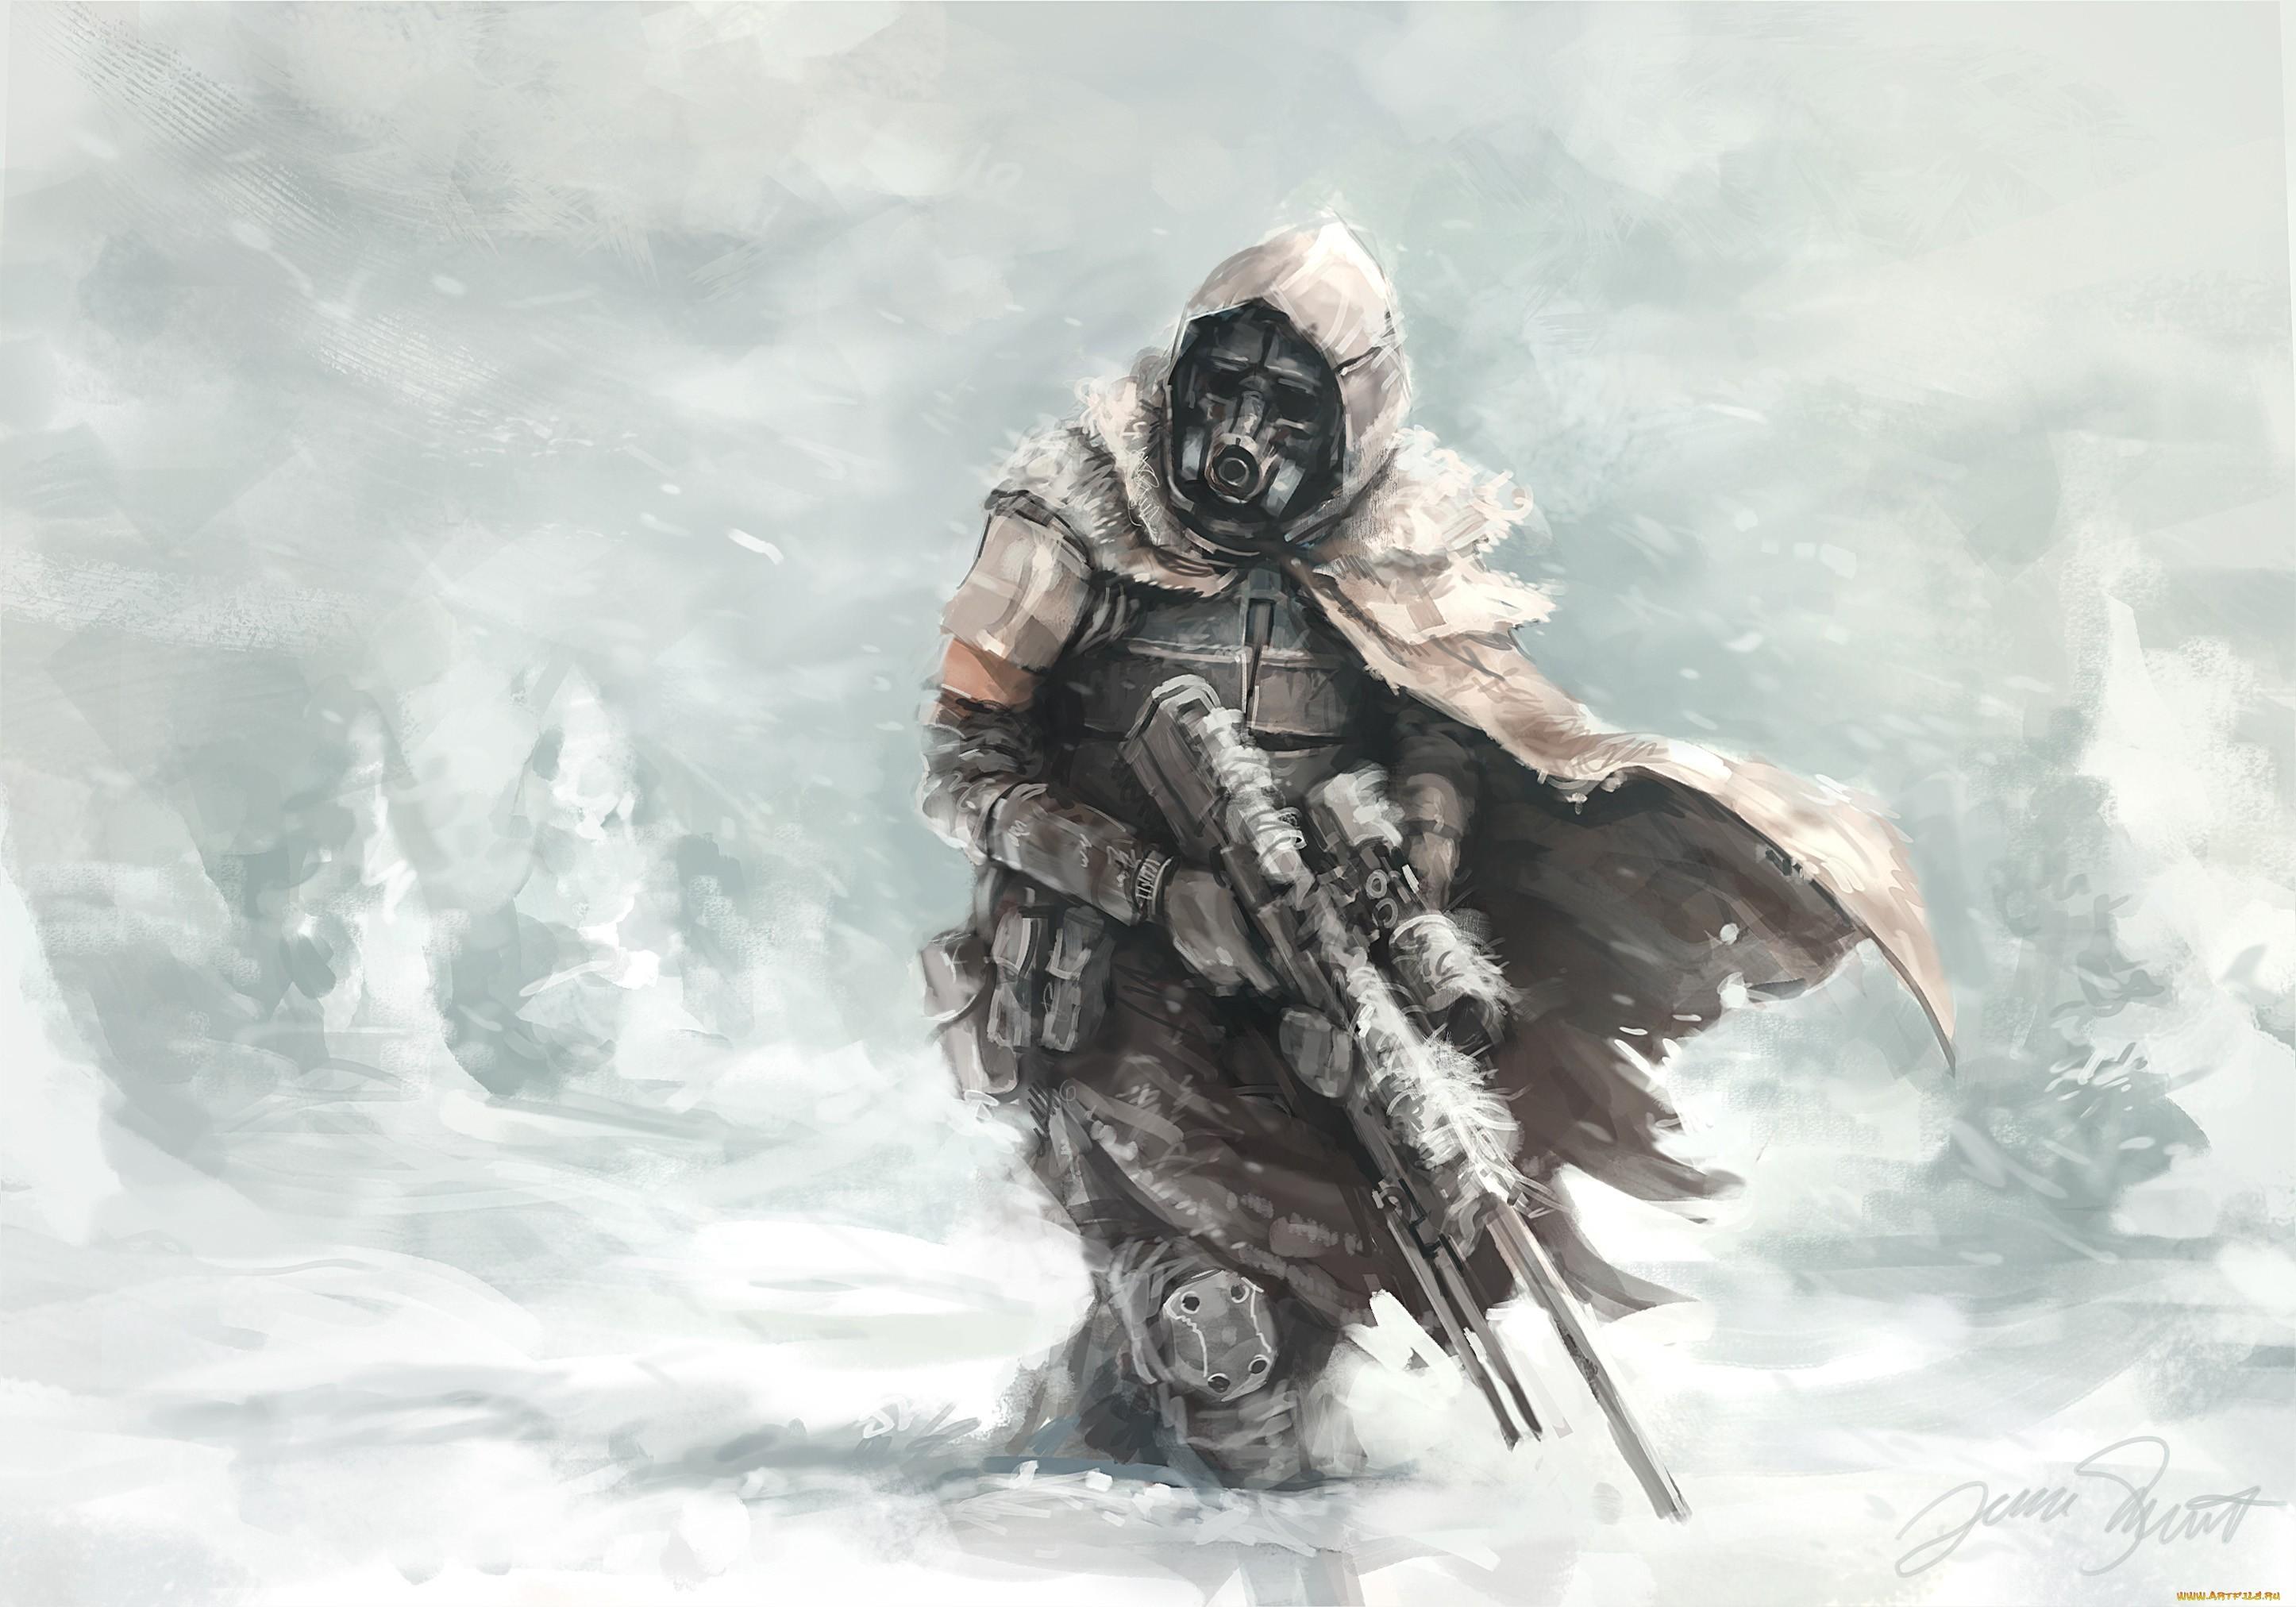 Pubg Sketch Hd: Wallpaper : Drawing, Illustration, Video Games, Winter